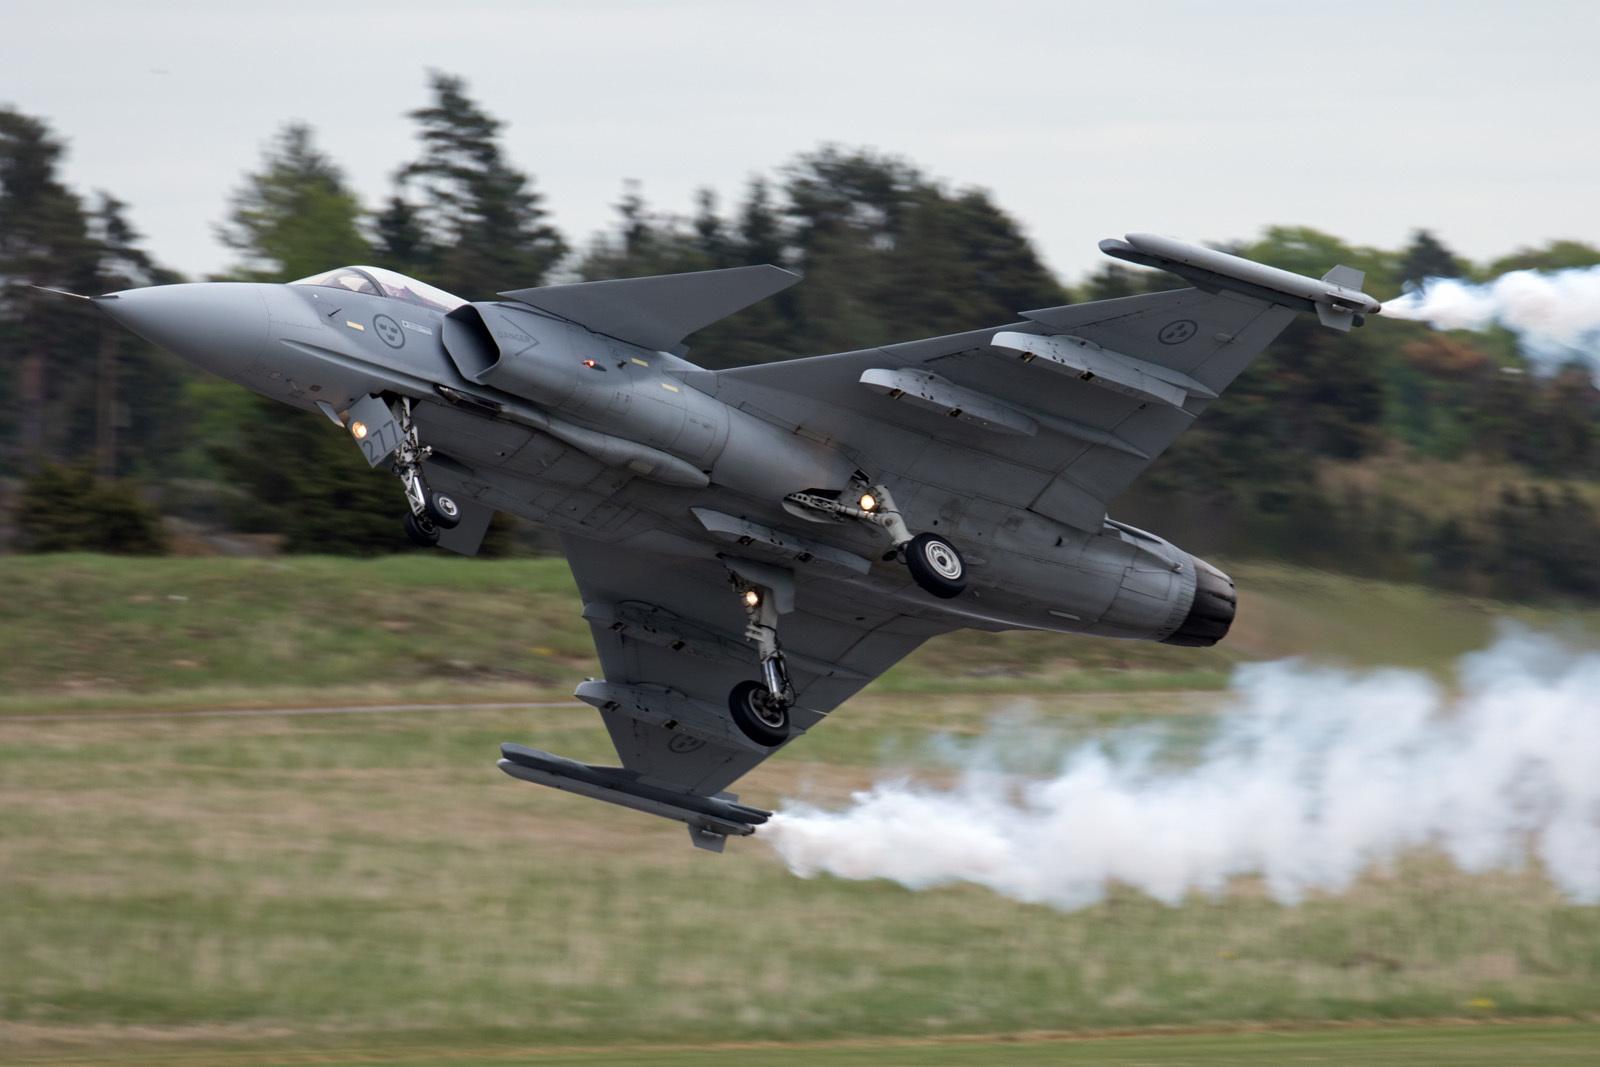 三代机vs四代机:歼-10C面对F-22A胜算多大?